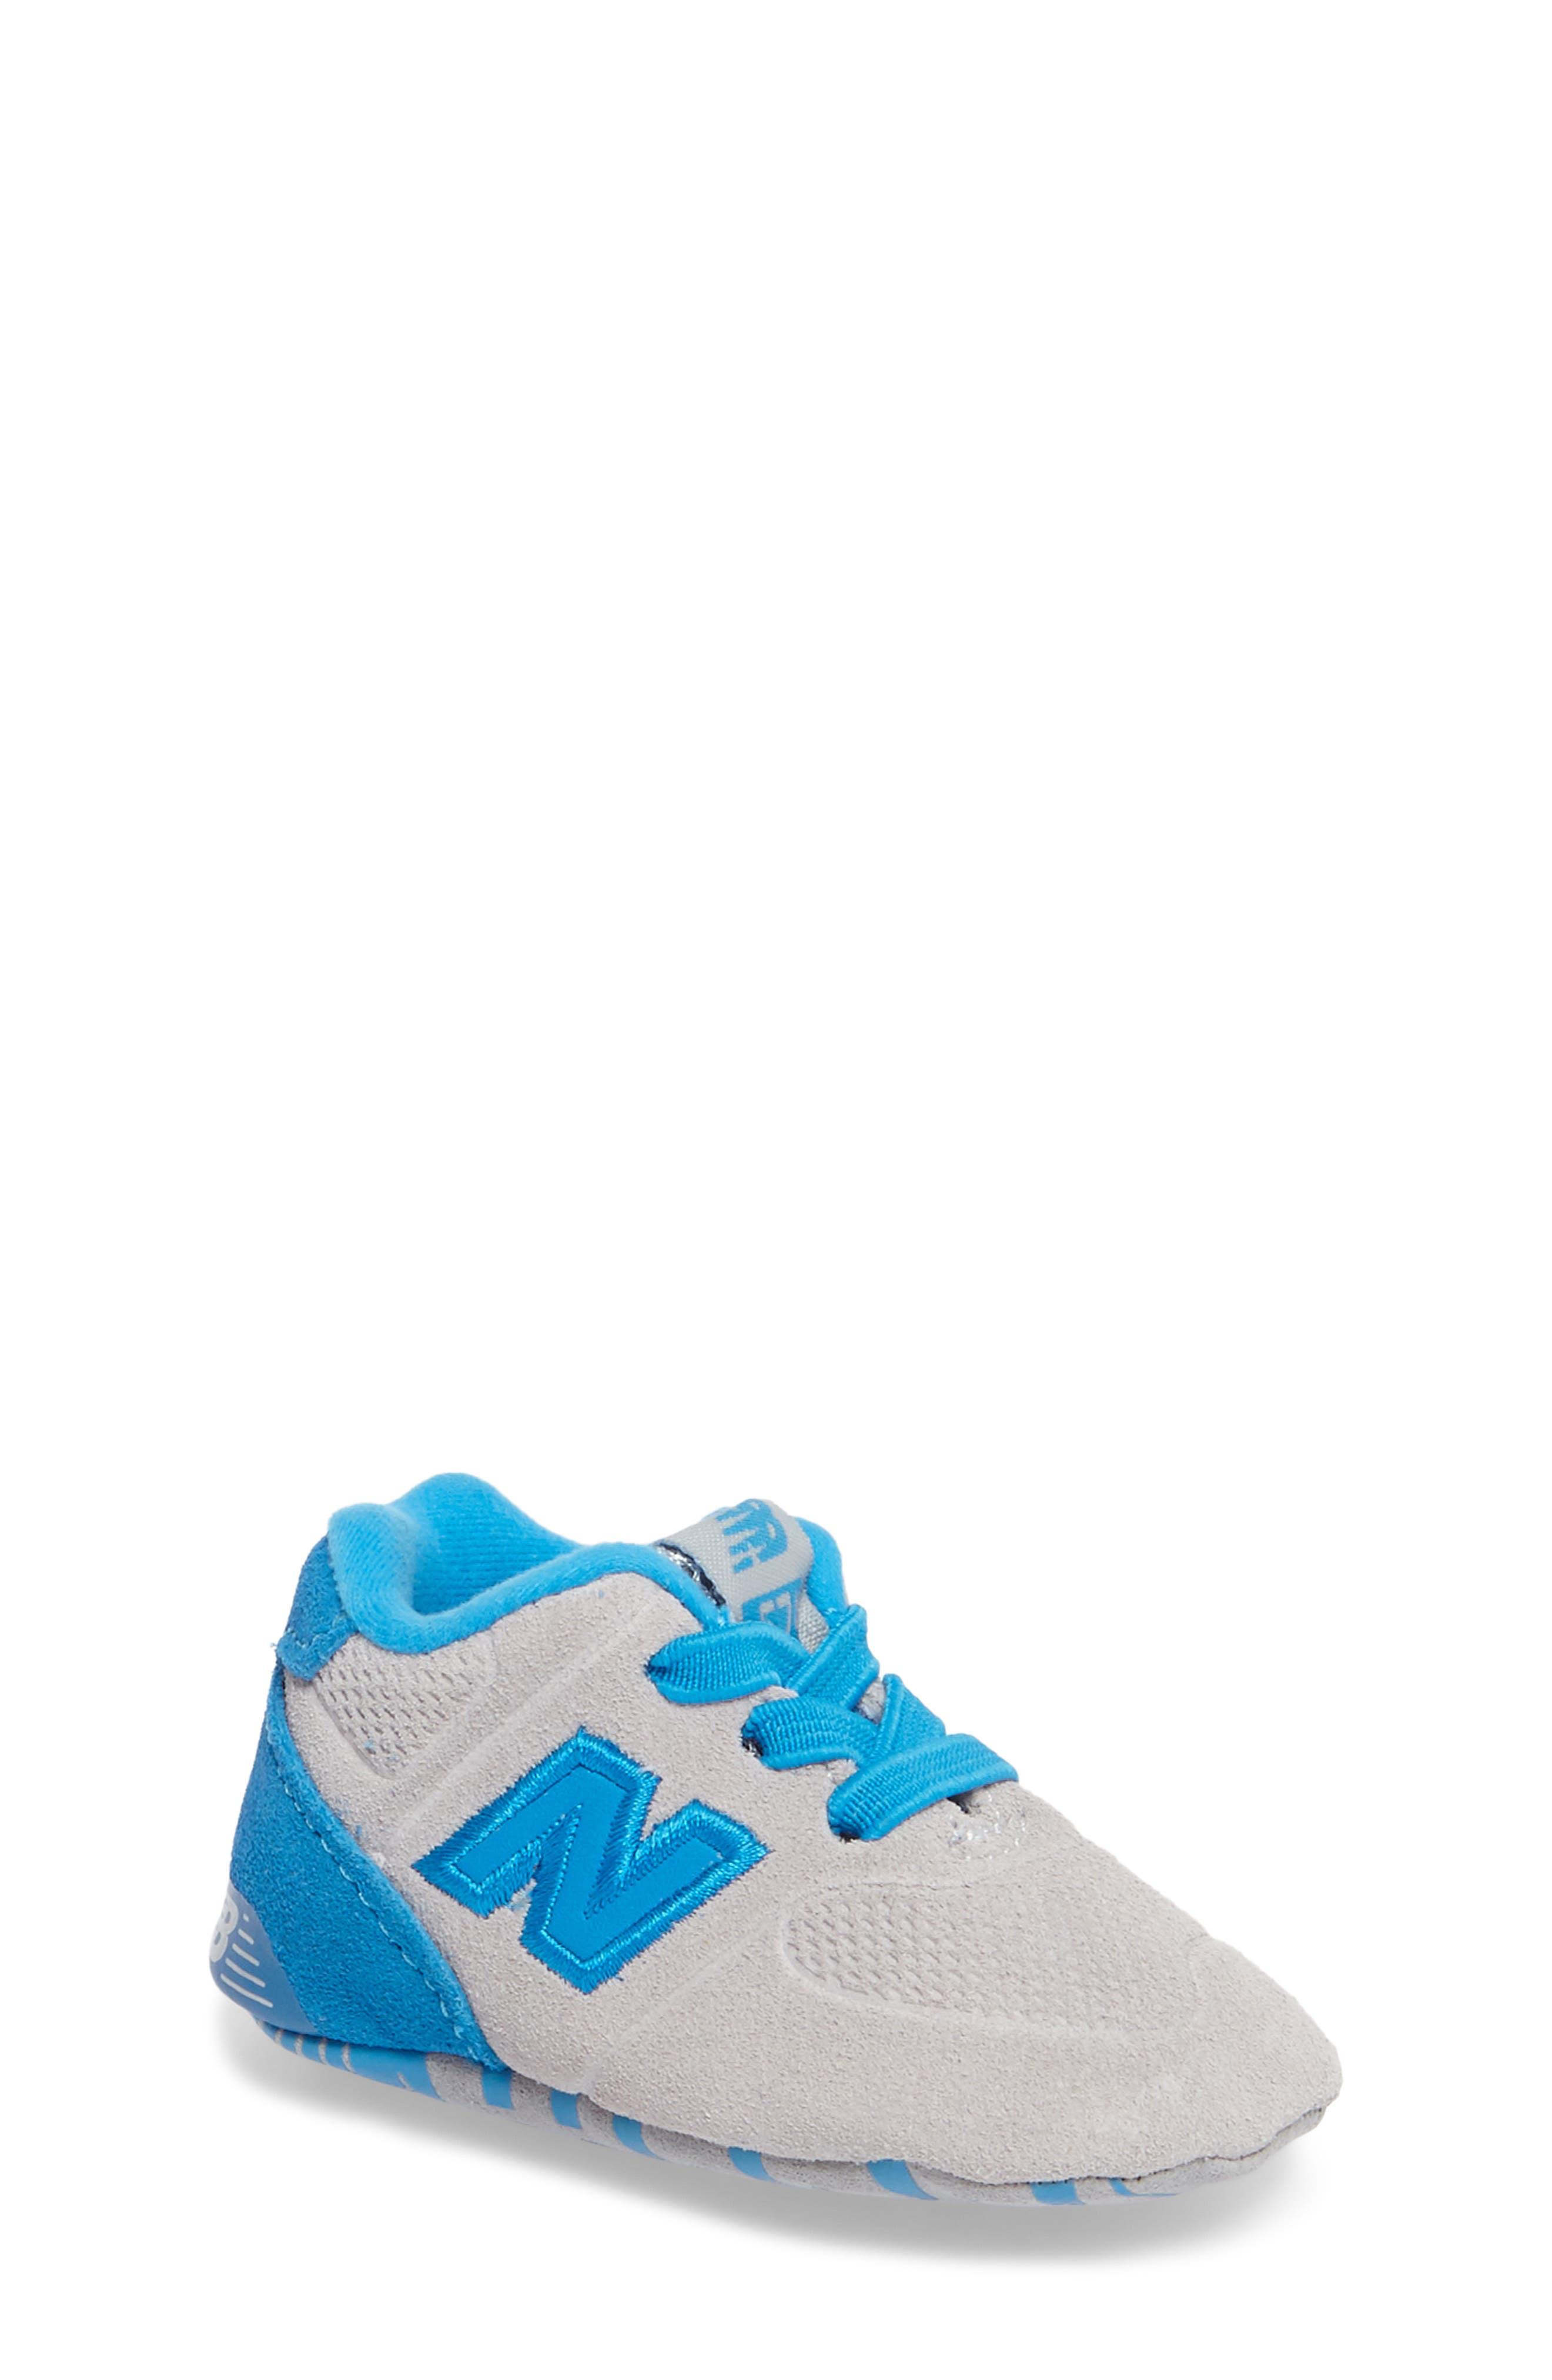 547 Crib Shoe,                             Main thumbnail 1, color,